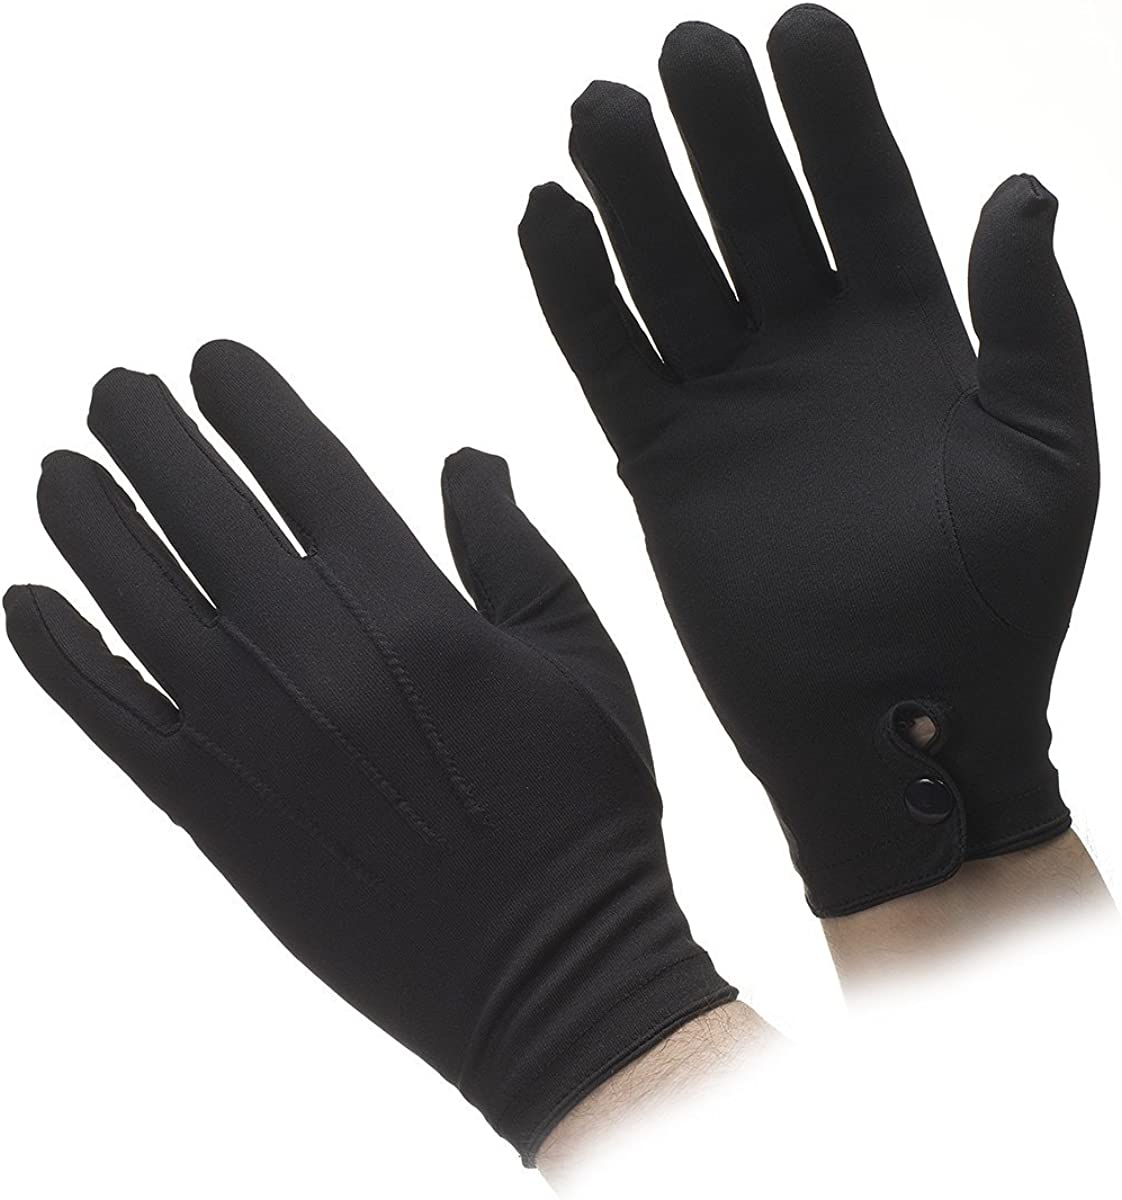 Mens Nylon Stretch Gloves MANY COLORS